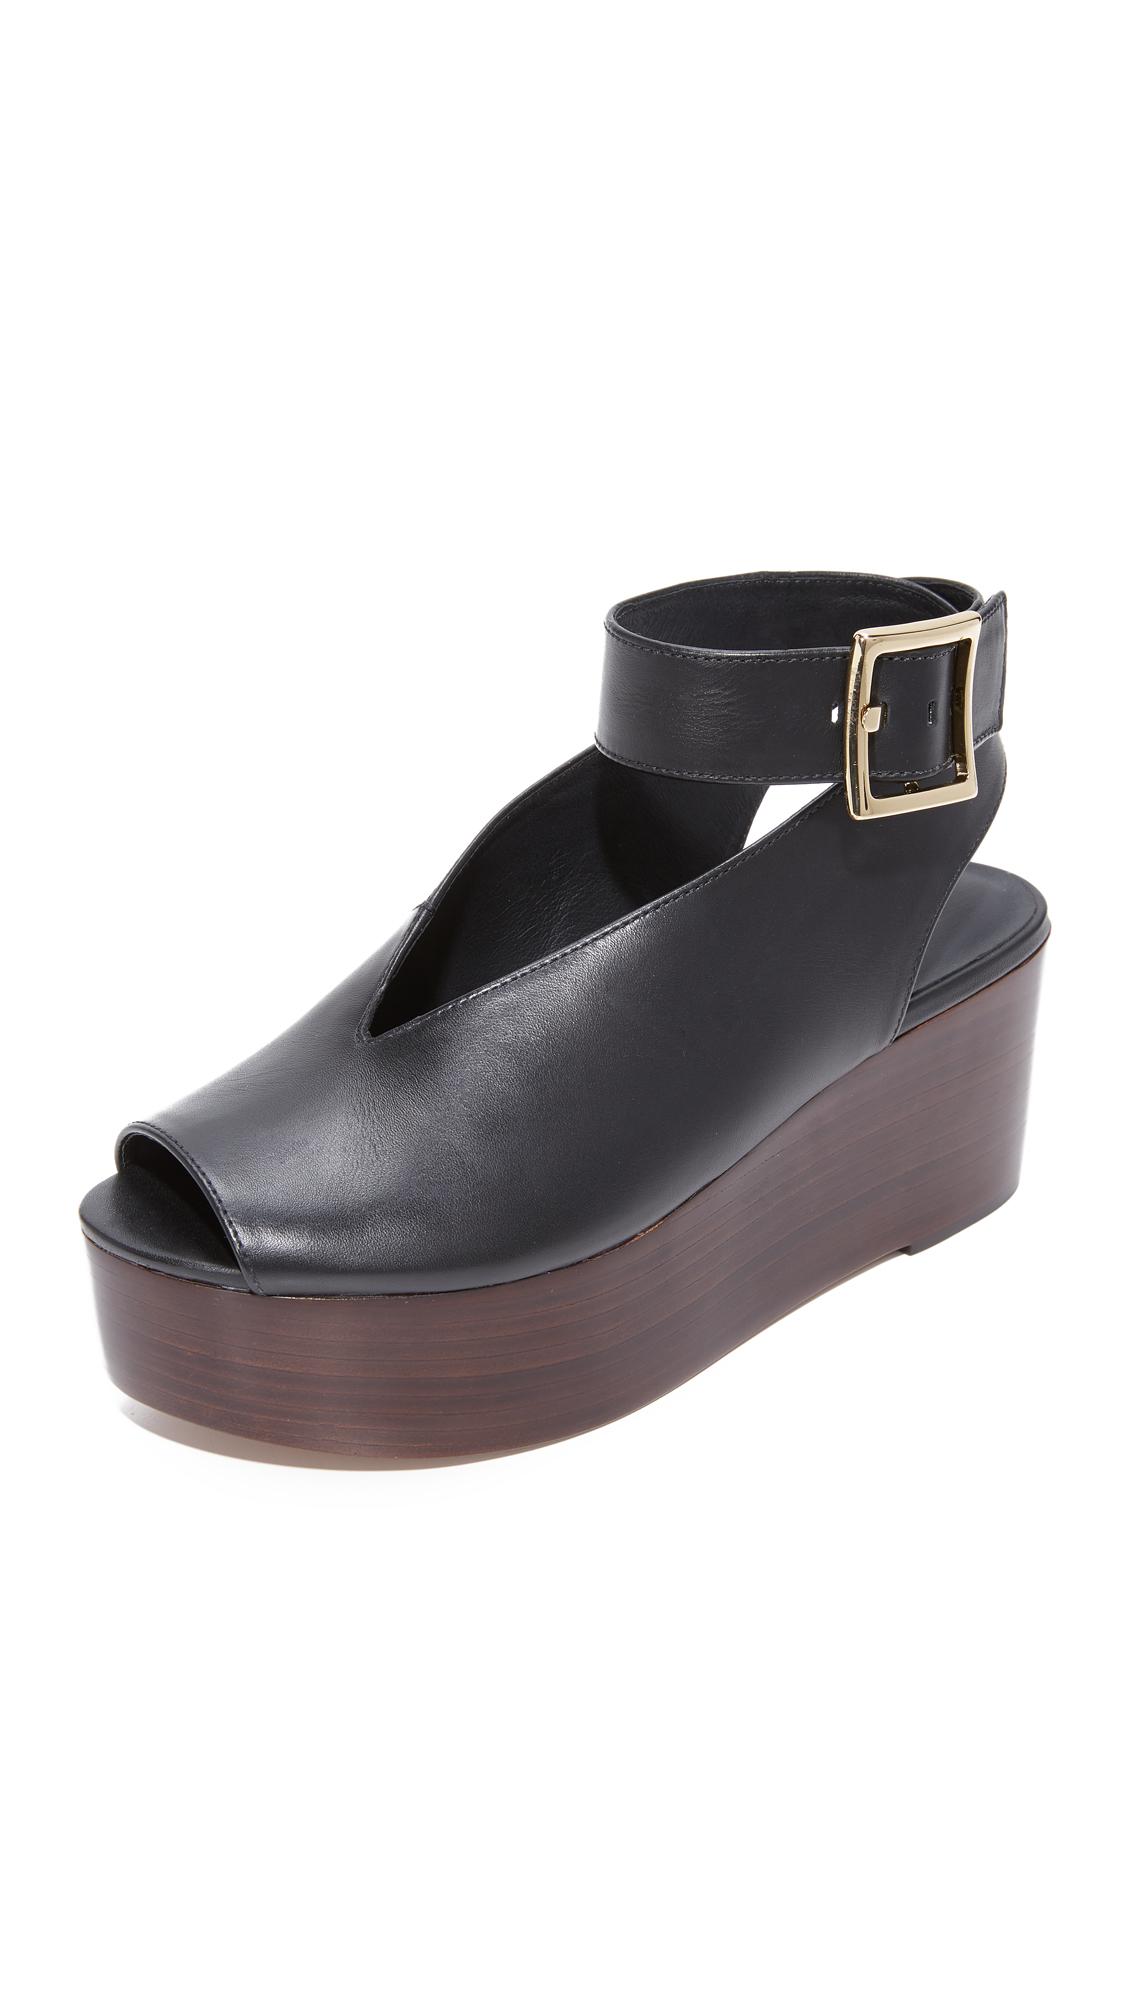 Tibi Camilla Flatform Sandals - Black